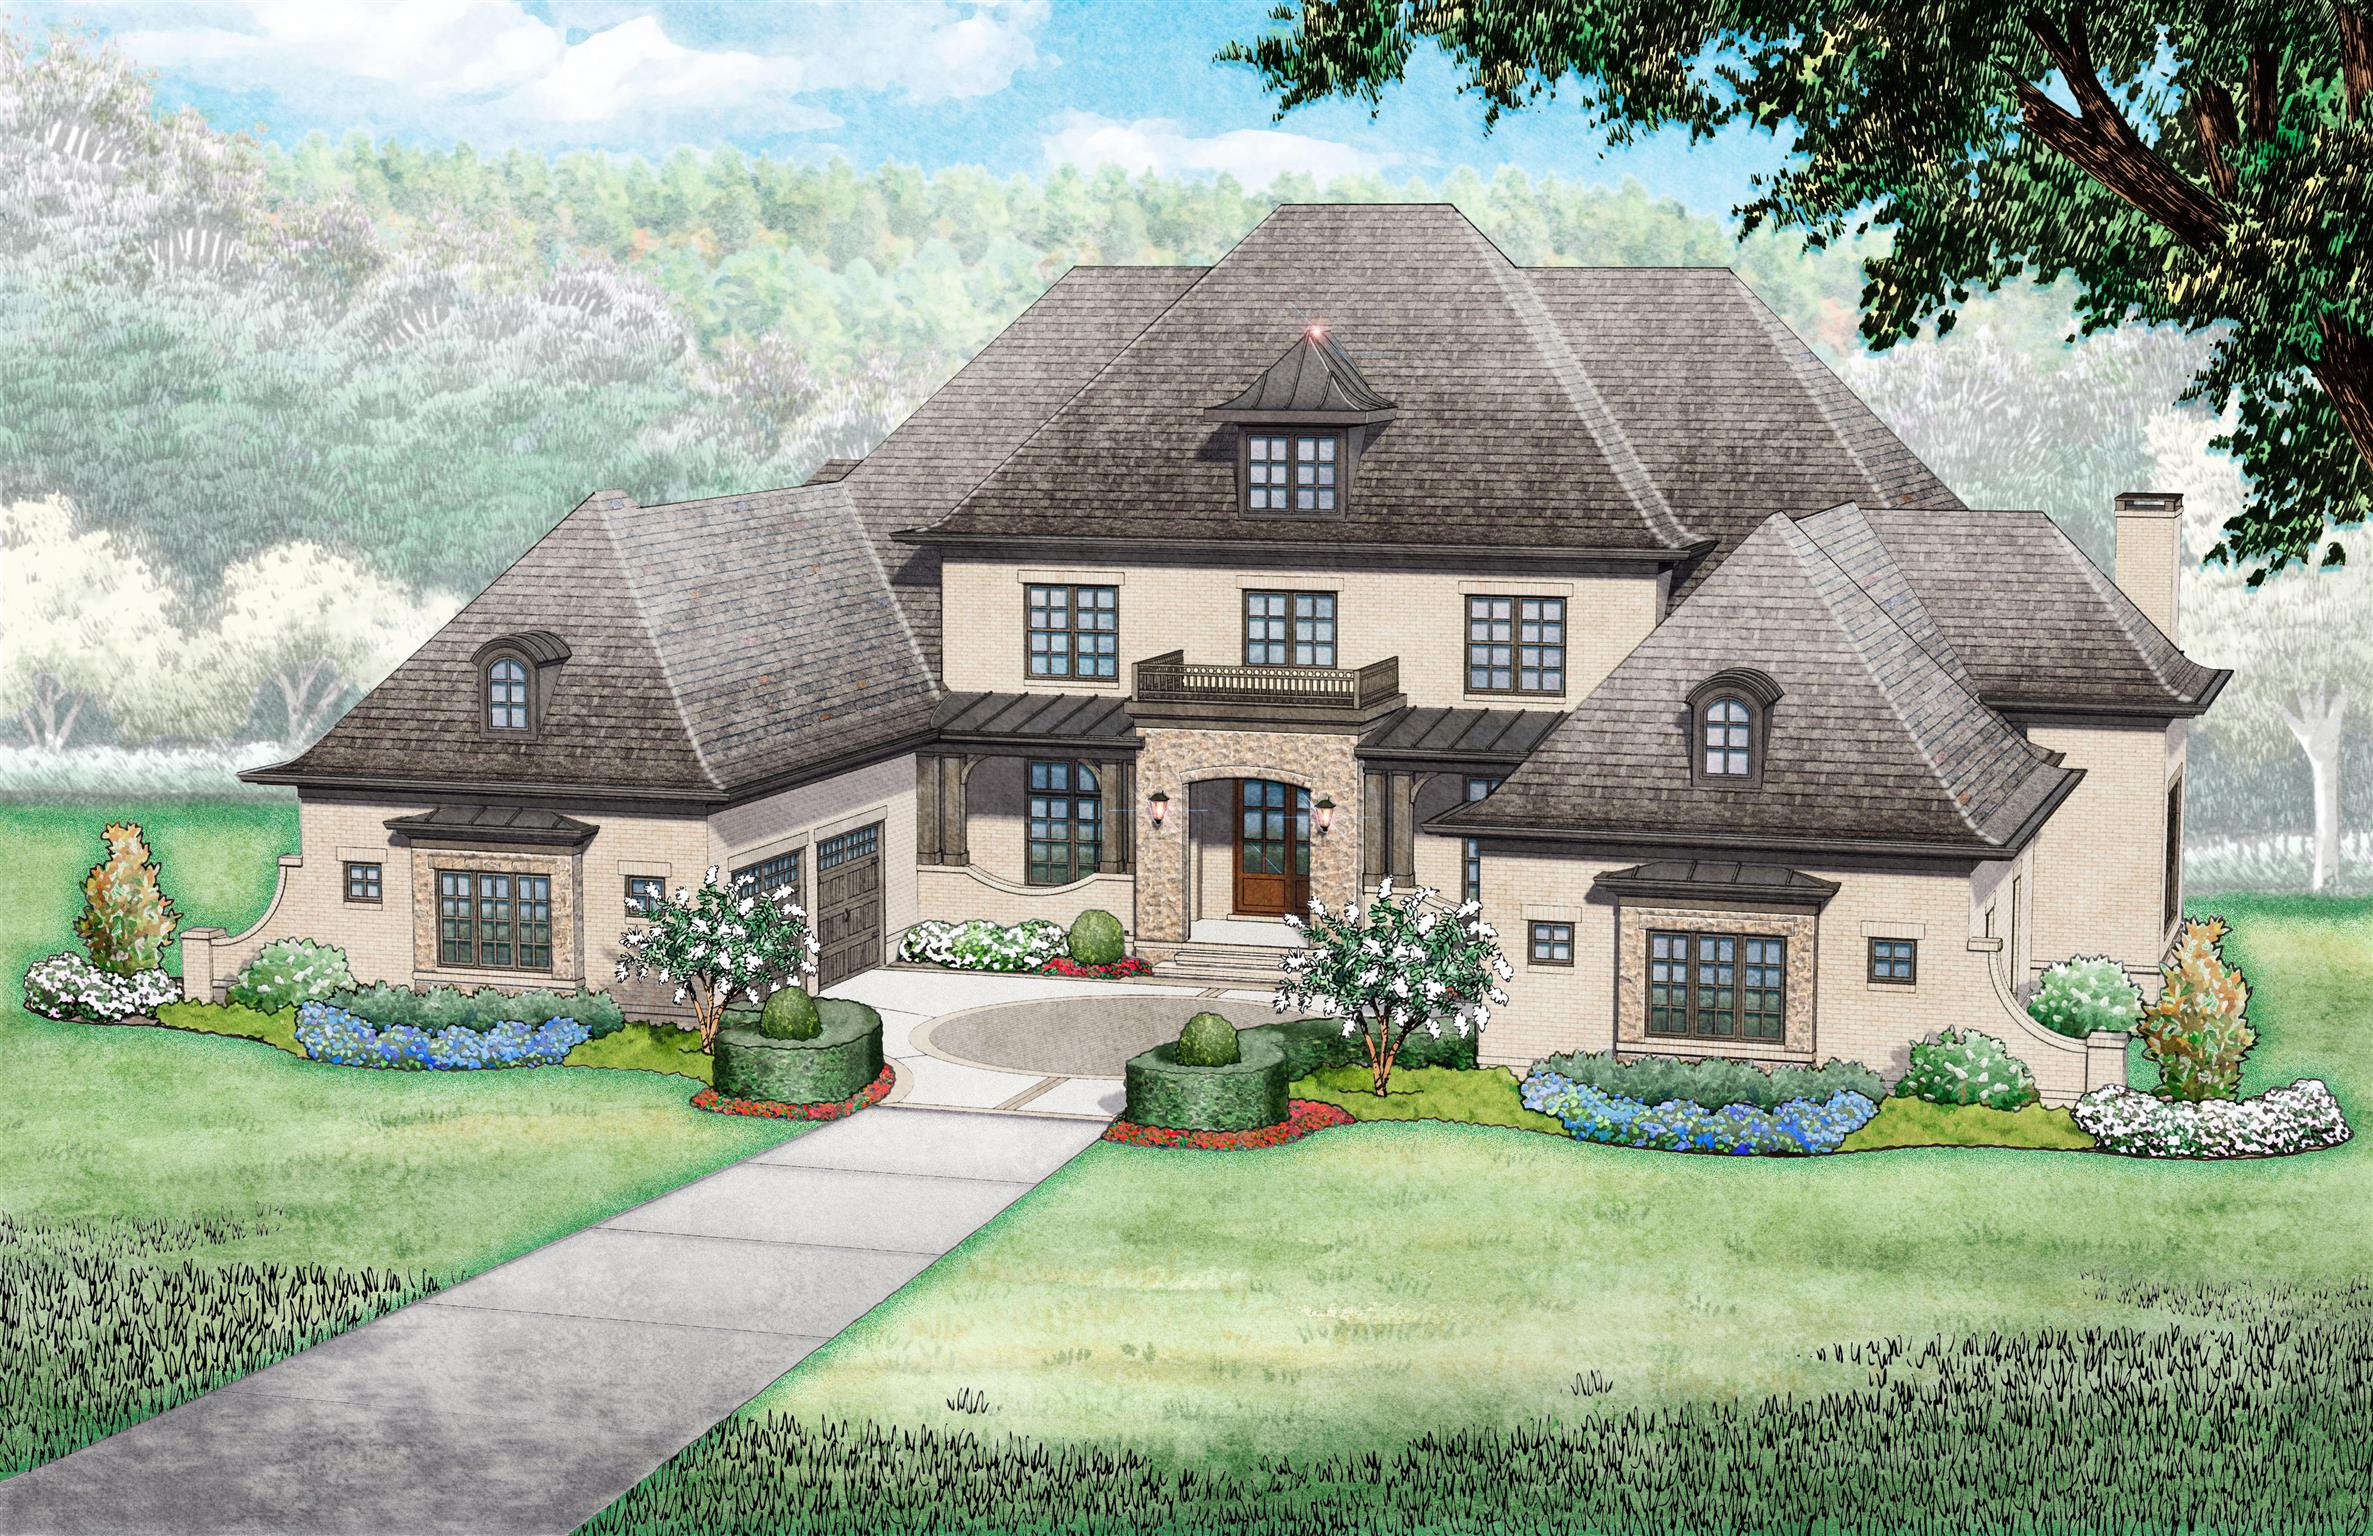 8583 Heirloom Blvd (Lot 7019), College Grove, TN 37046 - College Grove, TN real estate listing